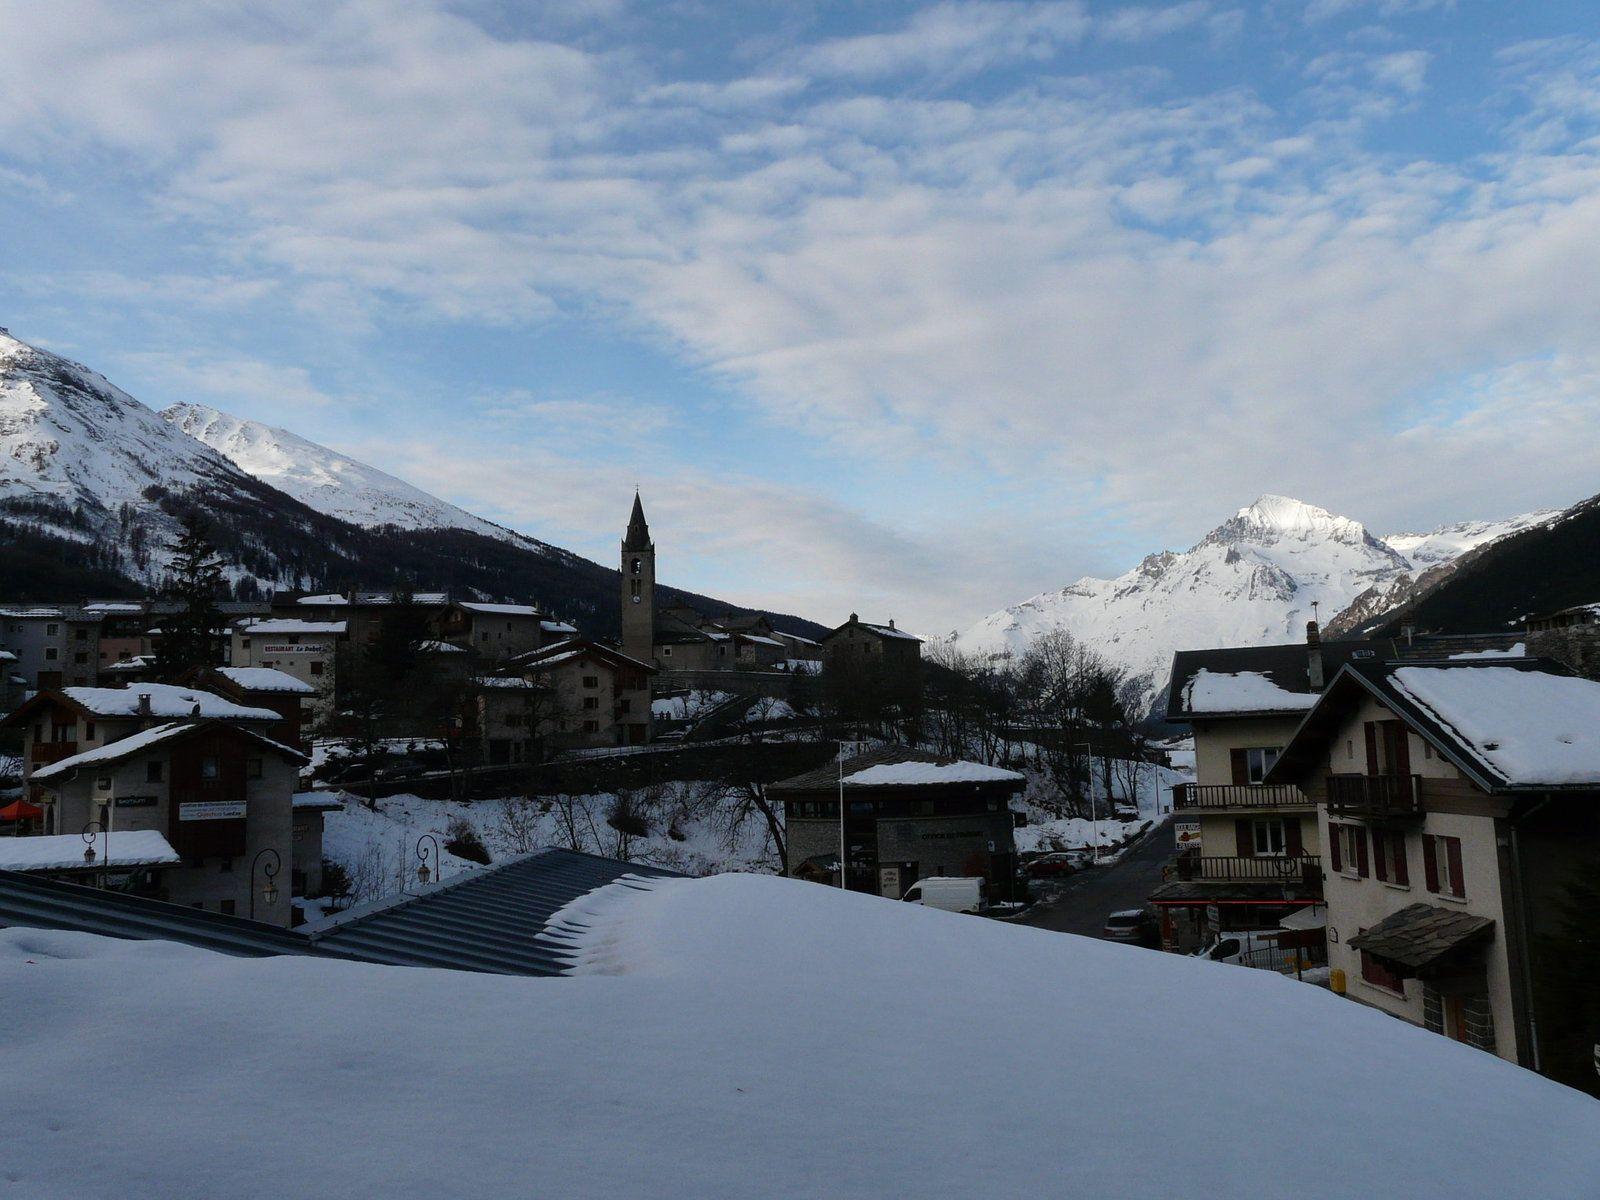 janvier - week-end à Val Cenis